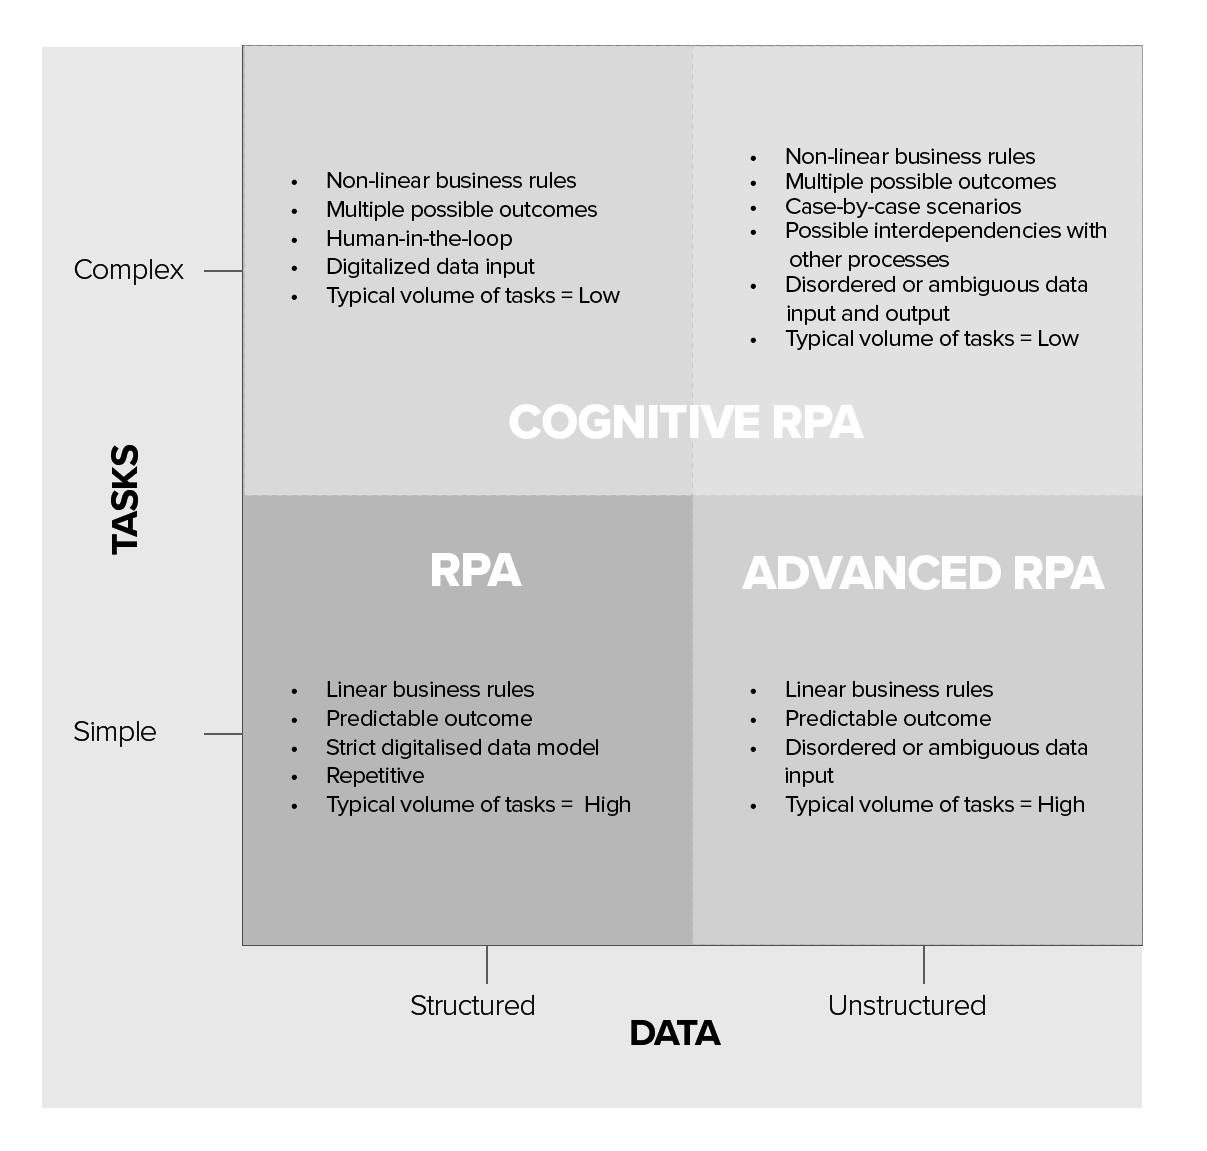 Process_RPA.png